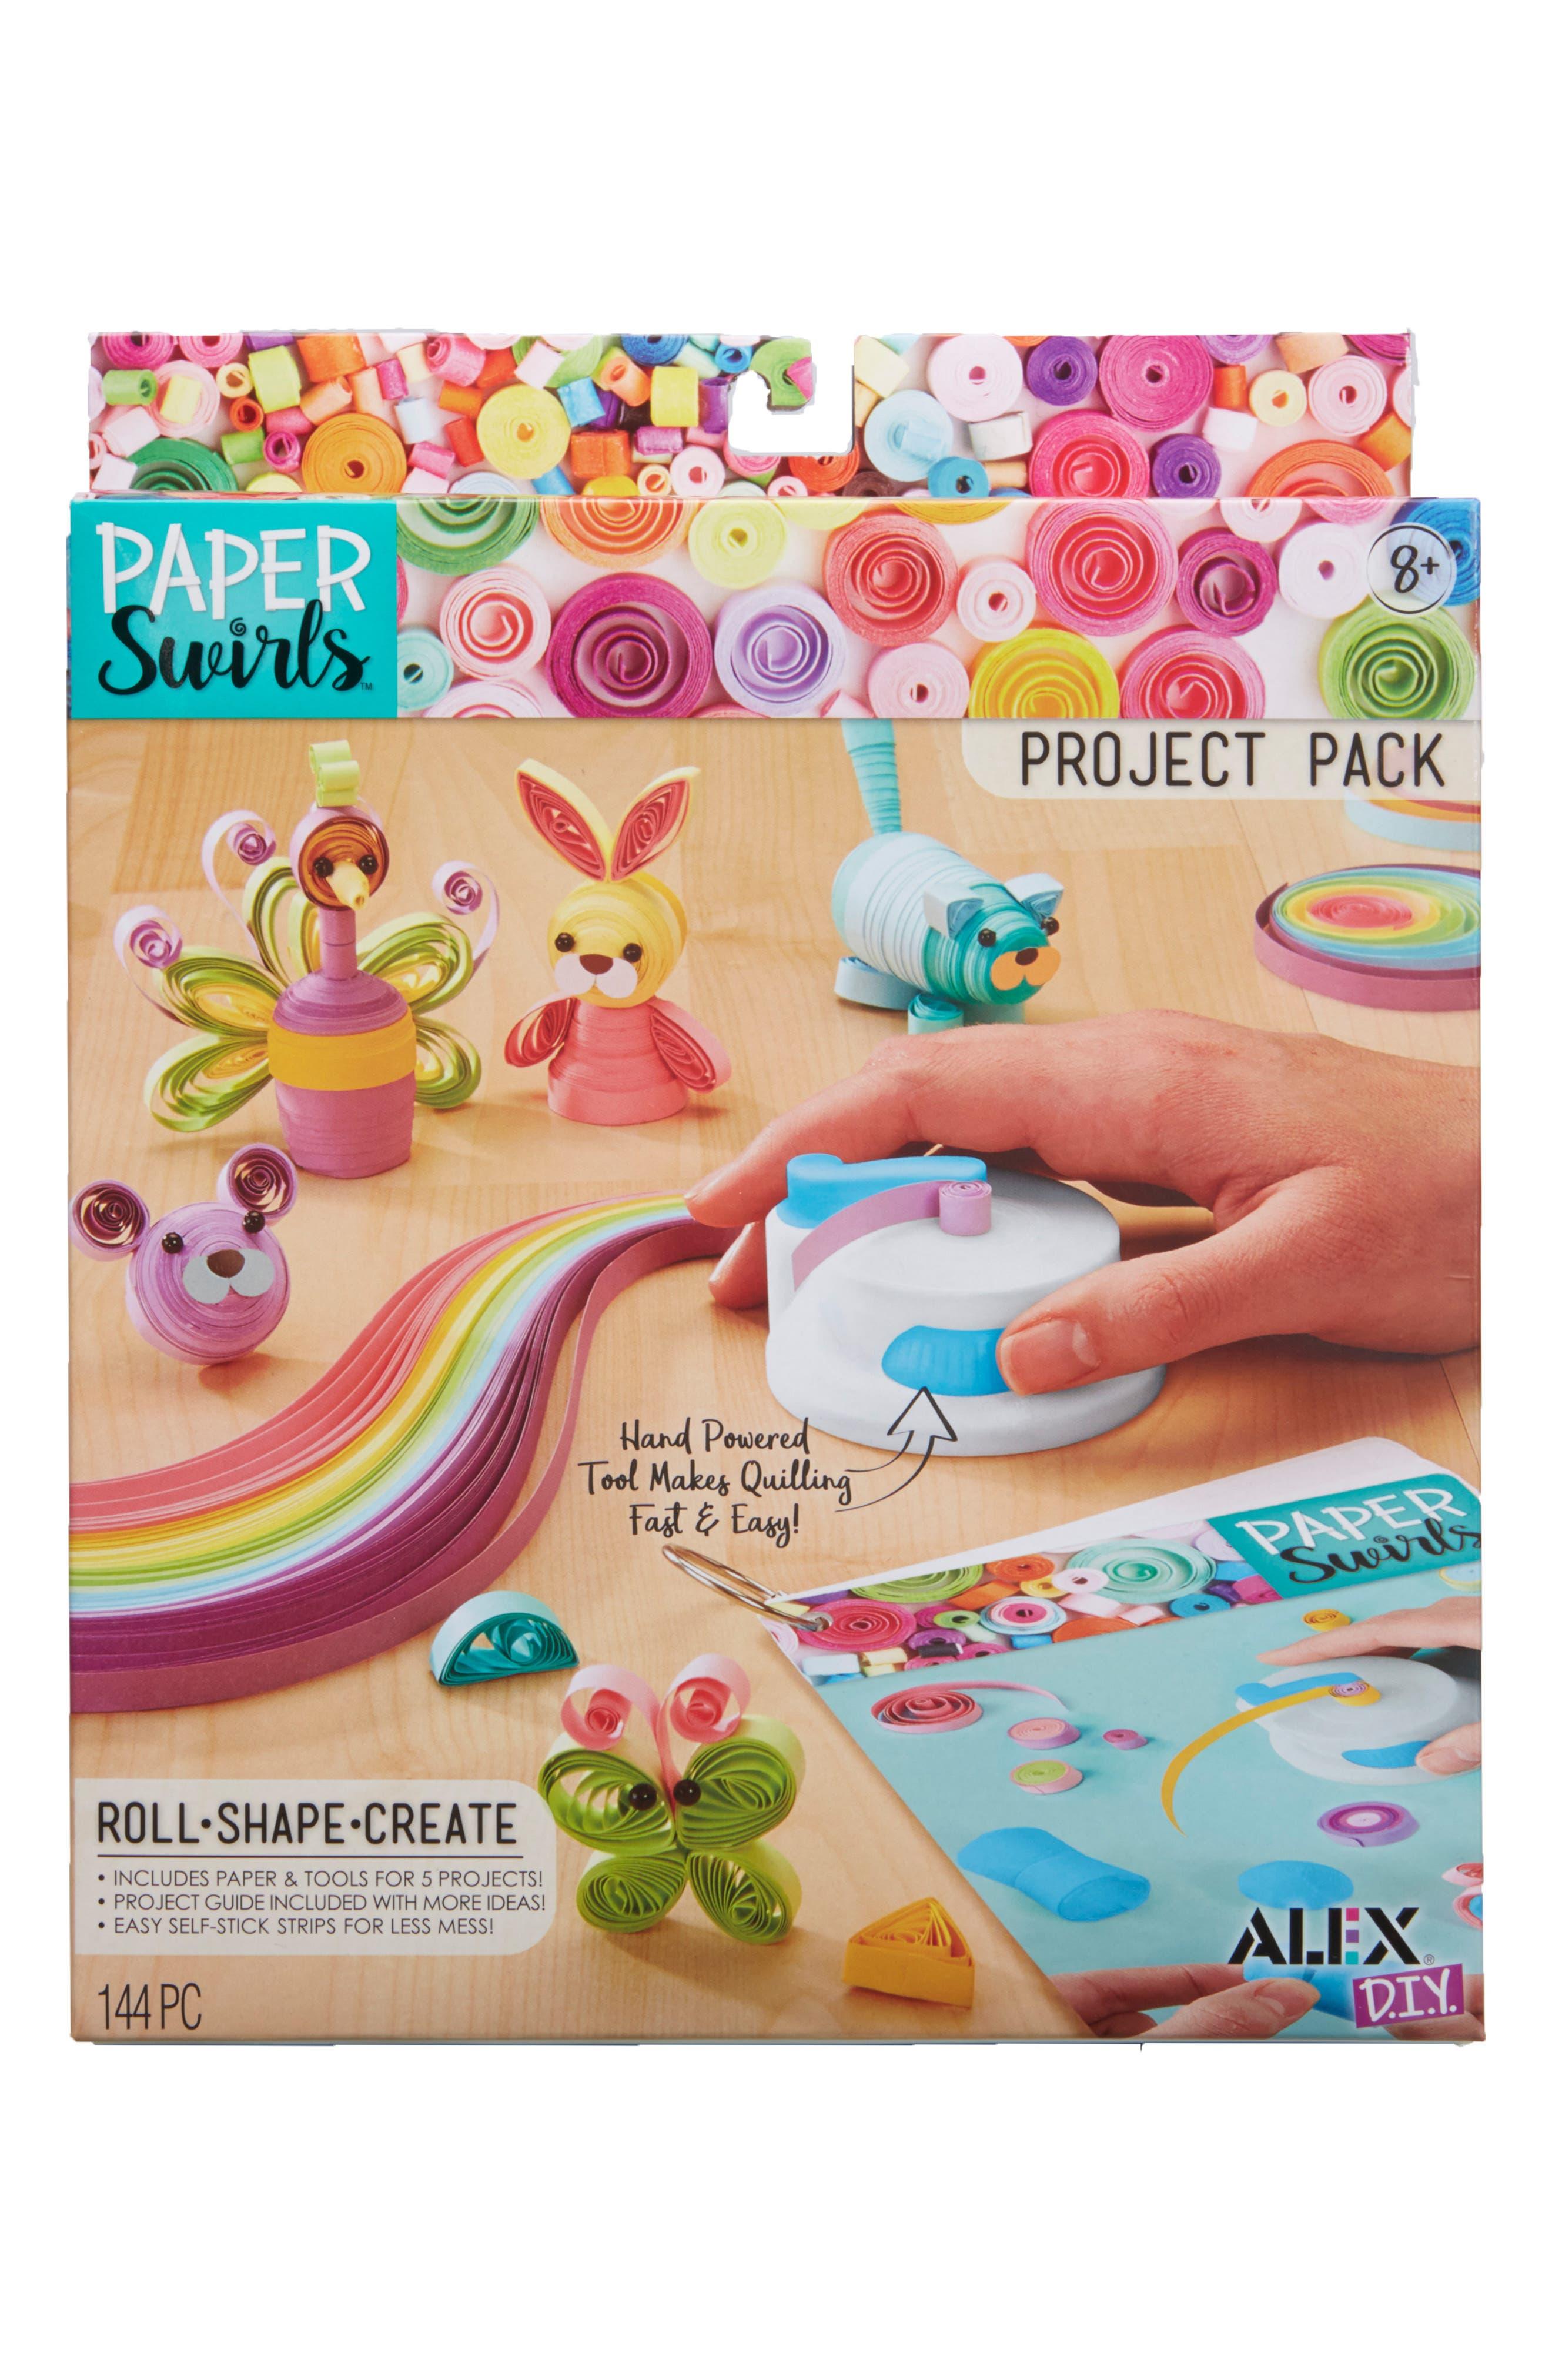 Alex Toys Diy Paper Swirls Project Pack